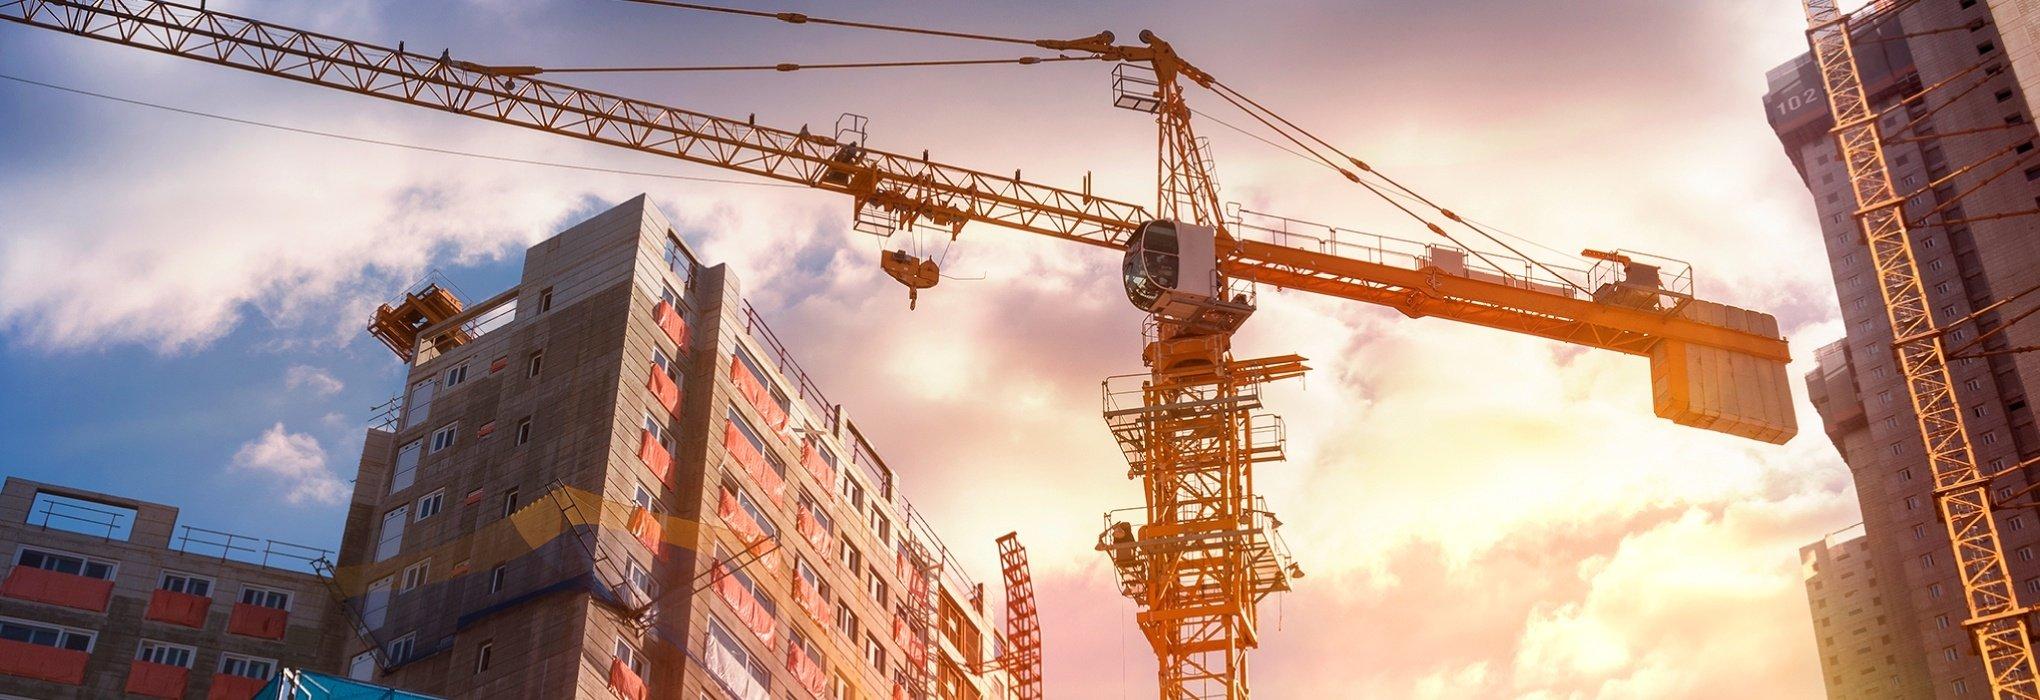 Commercial Contractor Los Angeles   General Construction Services